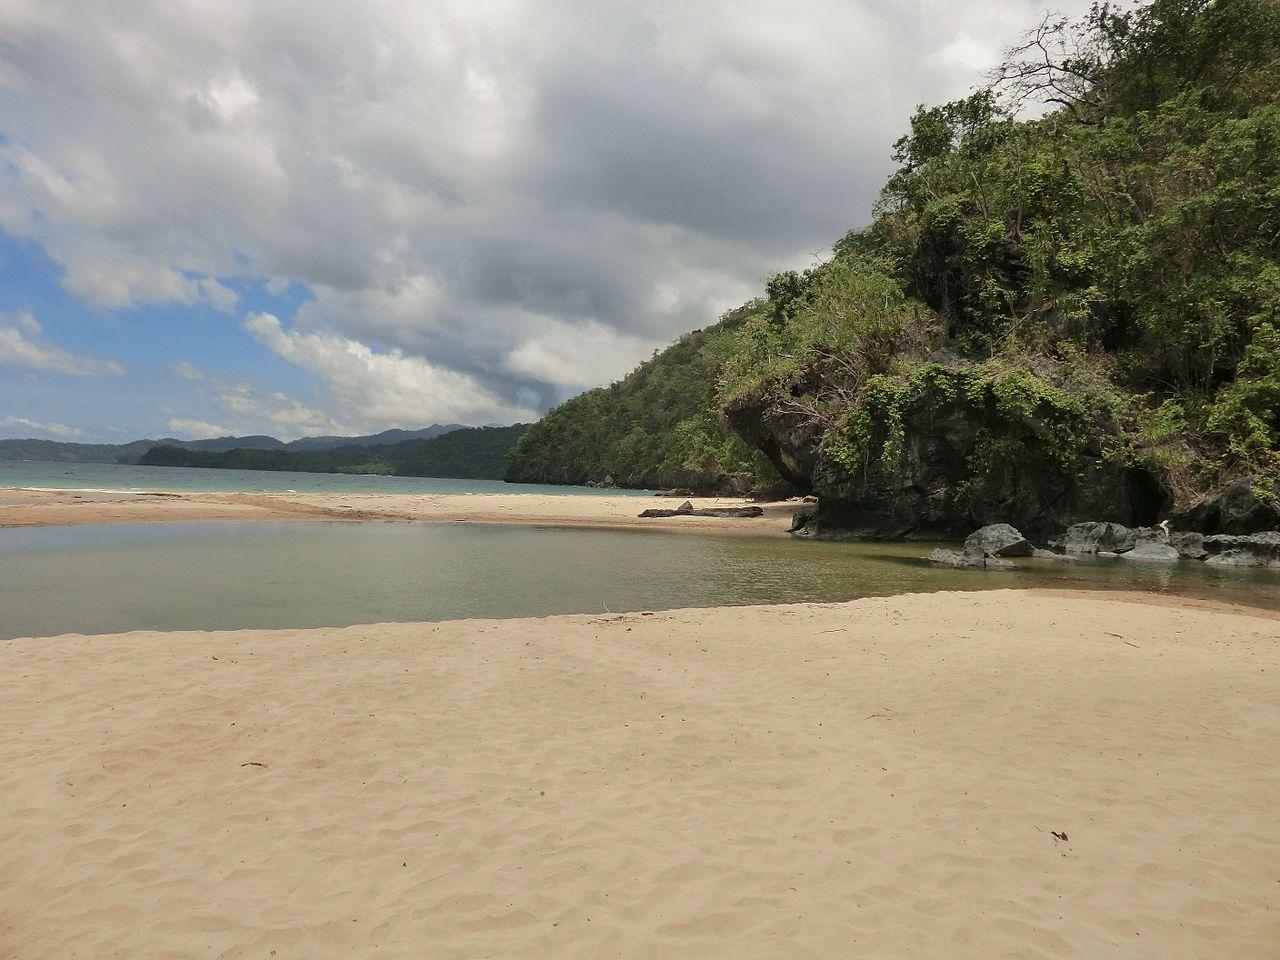 Puerto Princesa, Palawan, Philippines @ wikimedia commons / Daibo Taku